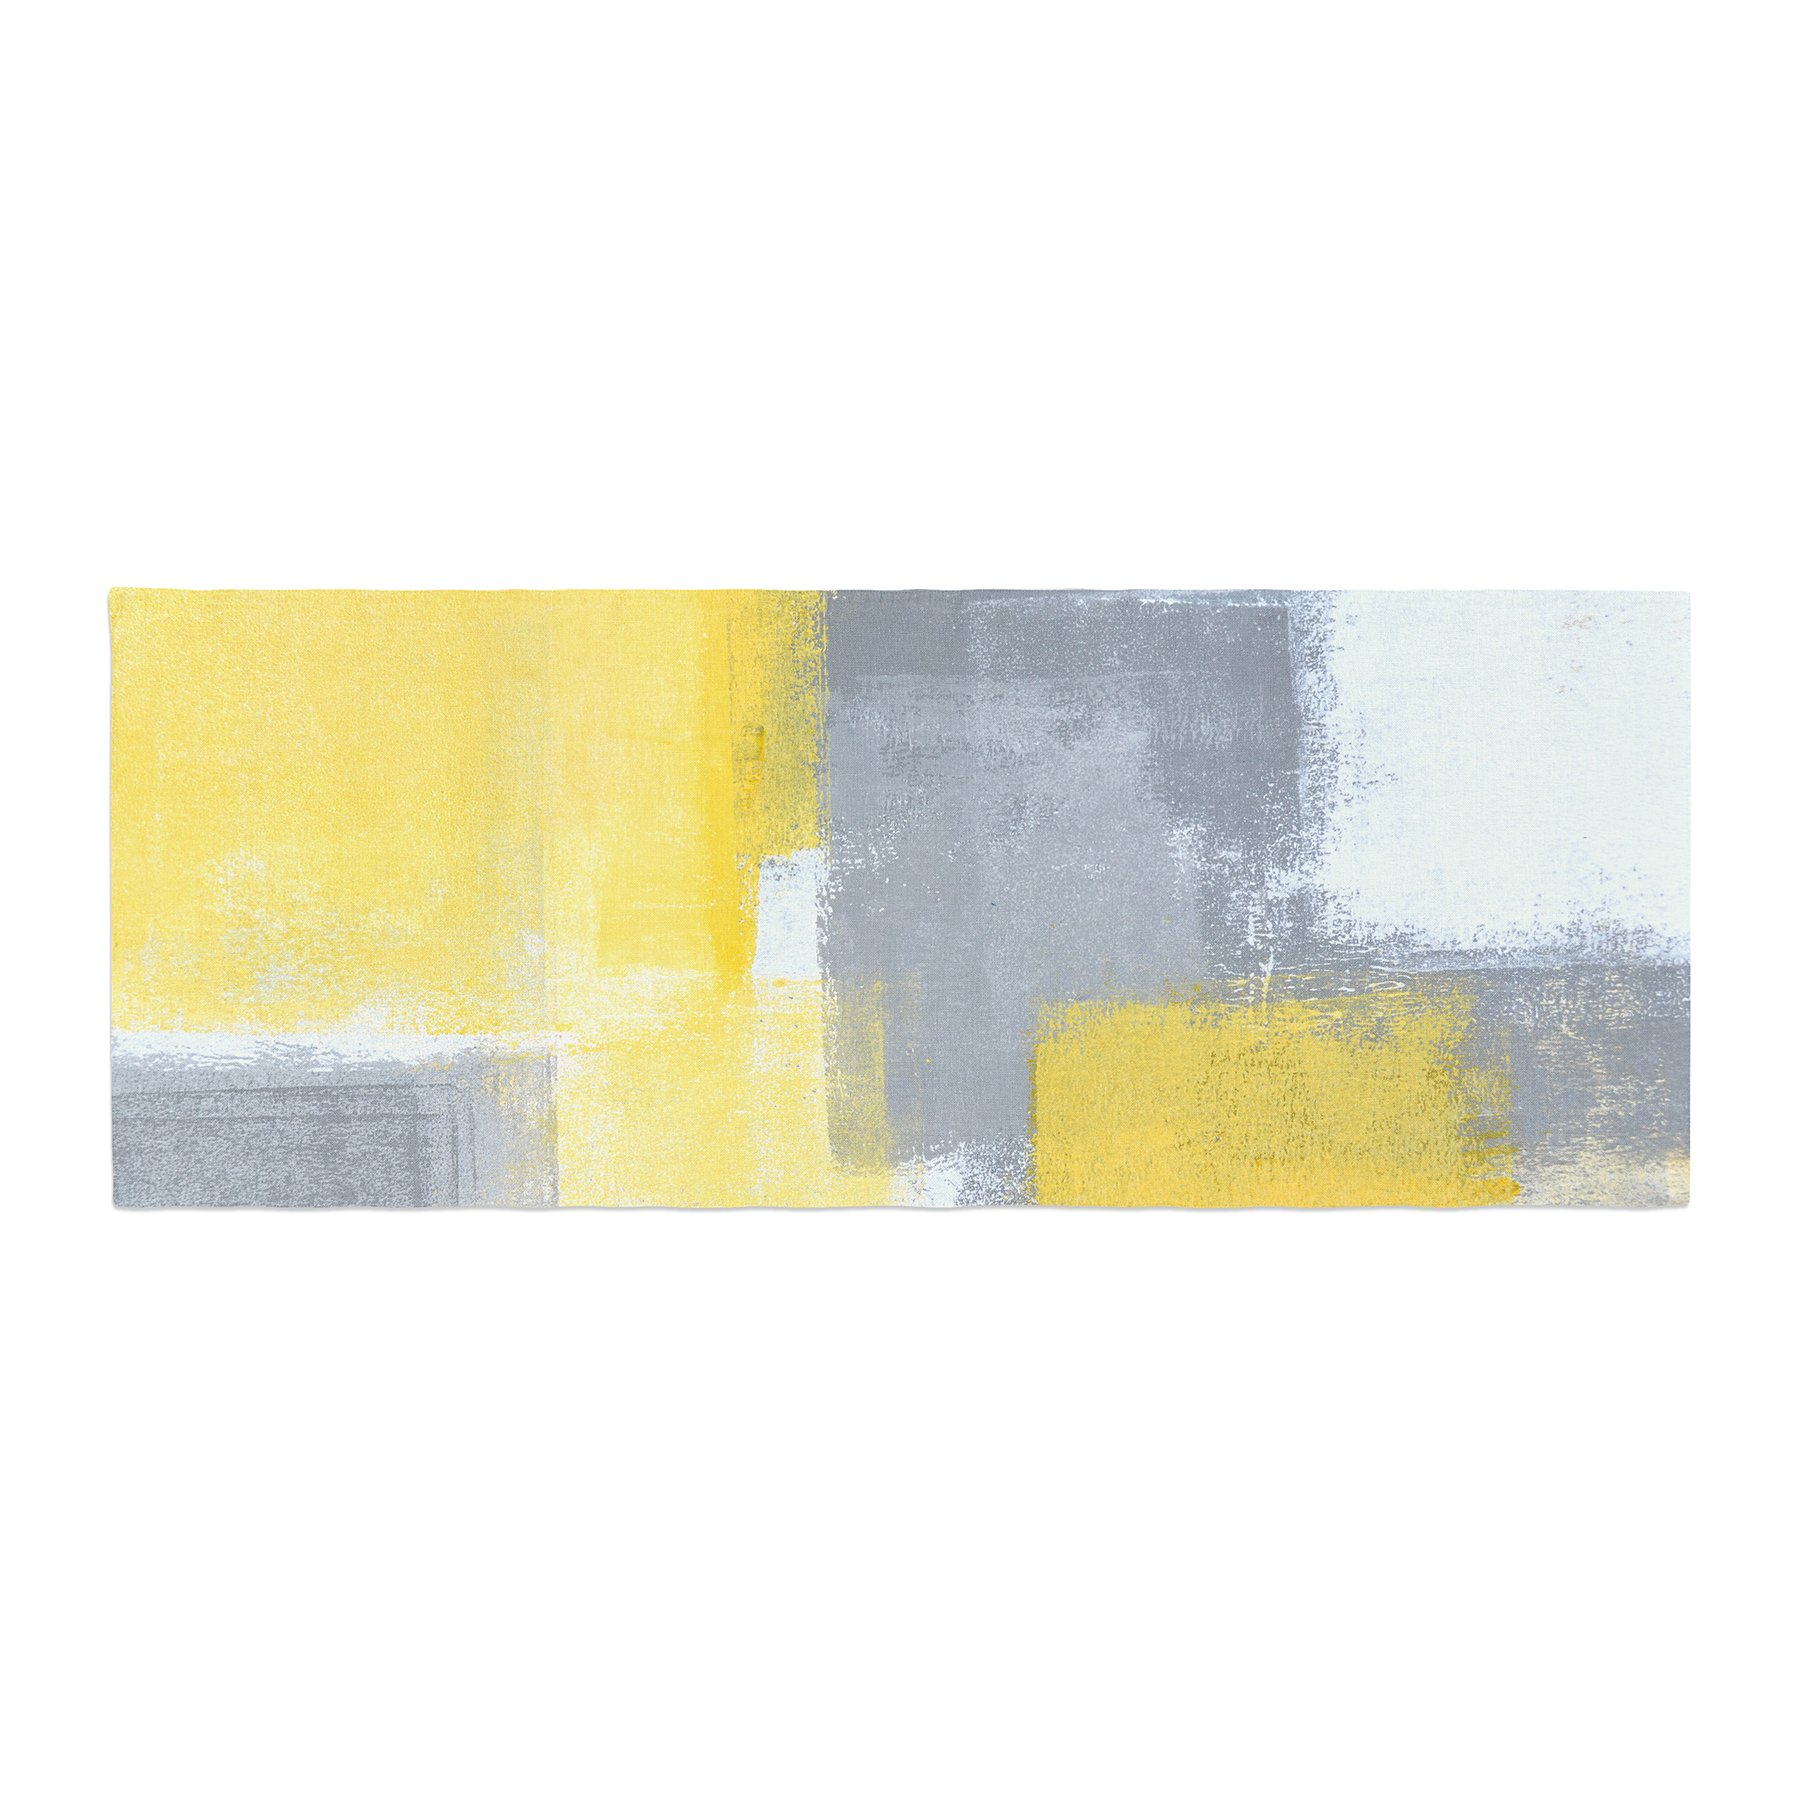 Kess InHouse CarolLynn Tice Steady Yellow Gray Bed Runner, 34'' x 86''